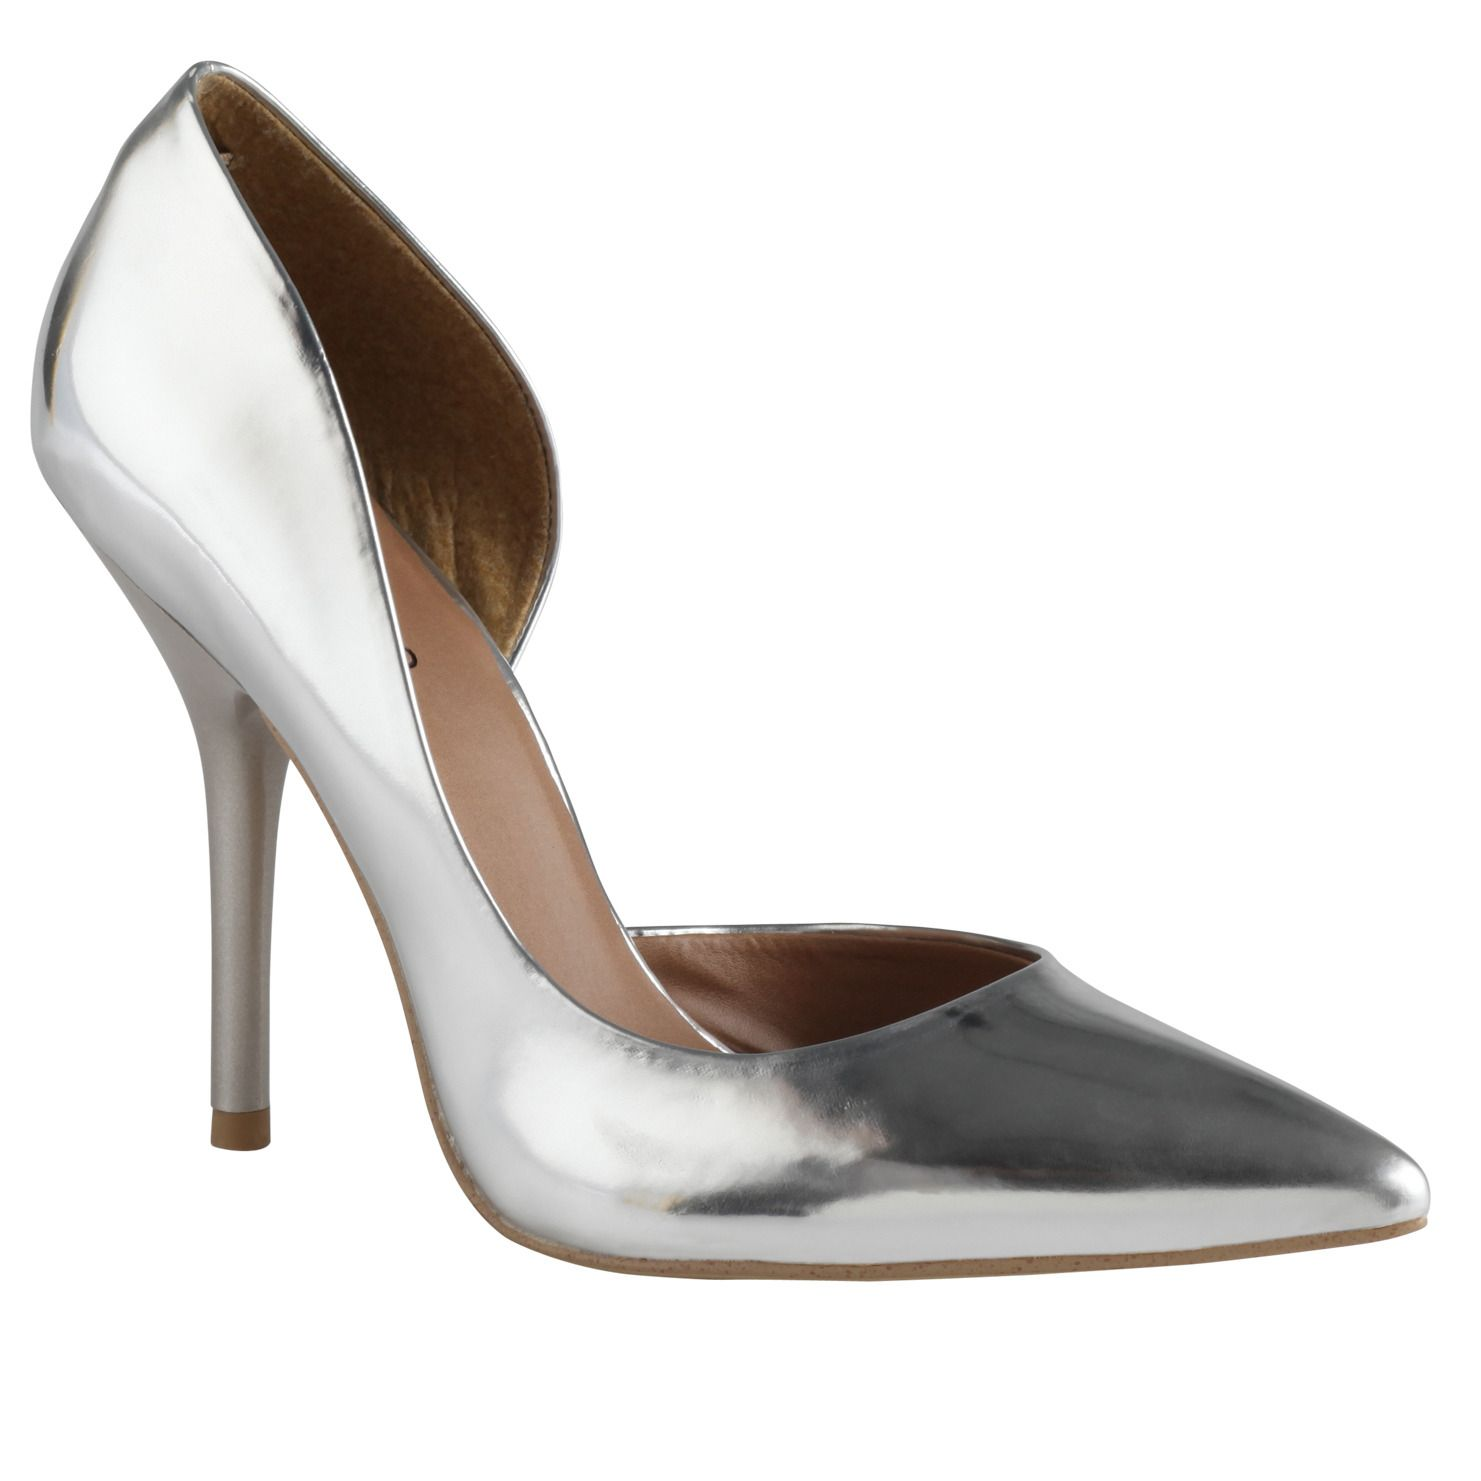 Buy SCHAPP women s shoes high heels at Call it Spring. Free Shipping ... 70c1d800ba3f